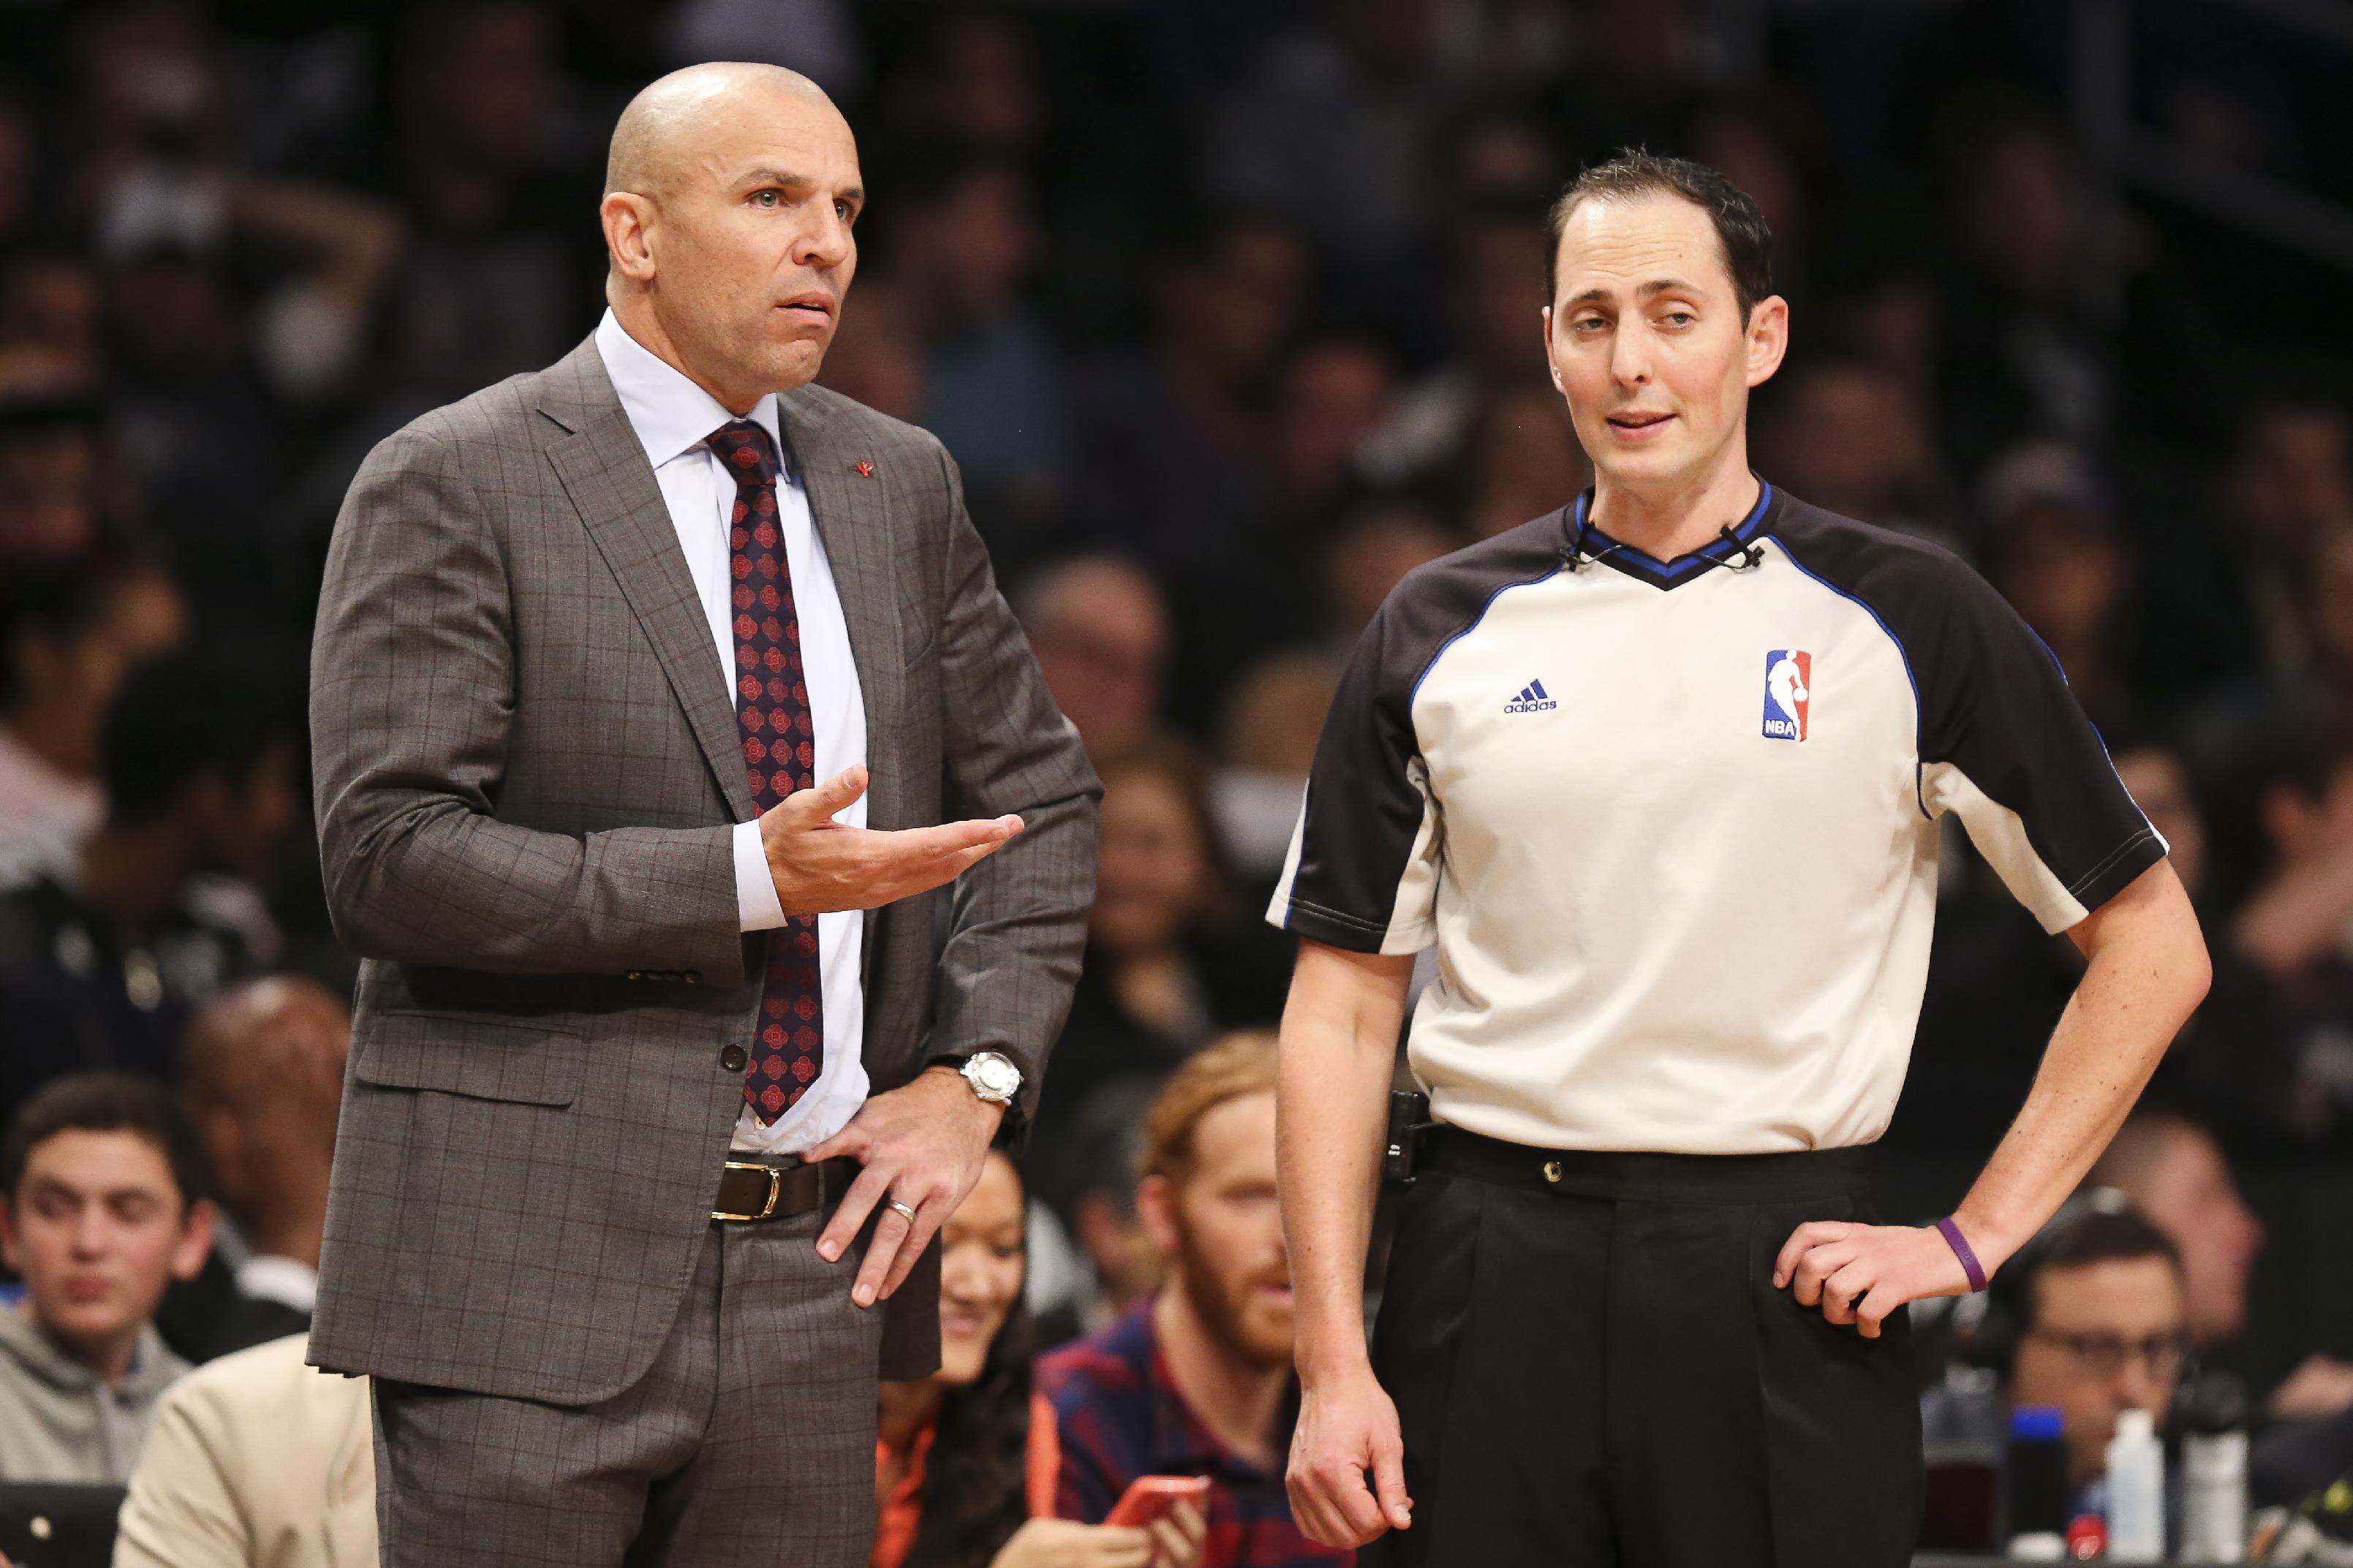 NBA fines Kidd $50,000 for spilling drink on court